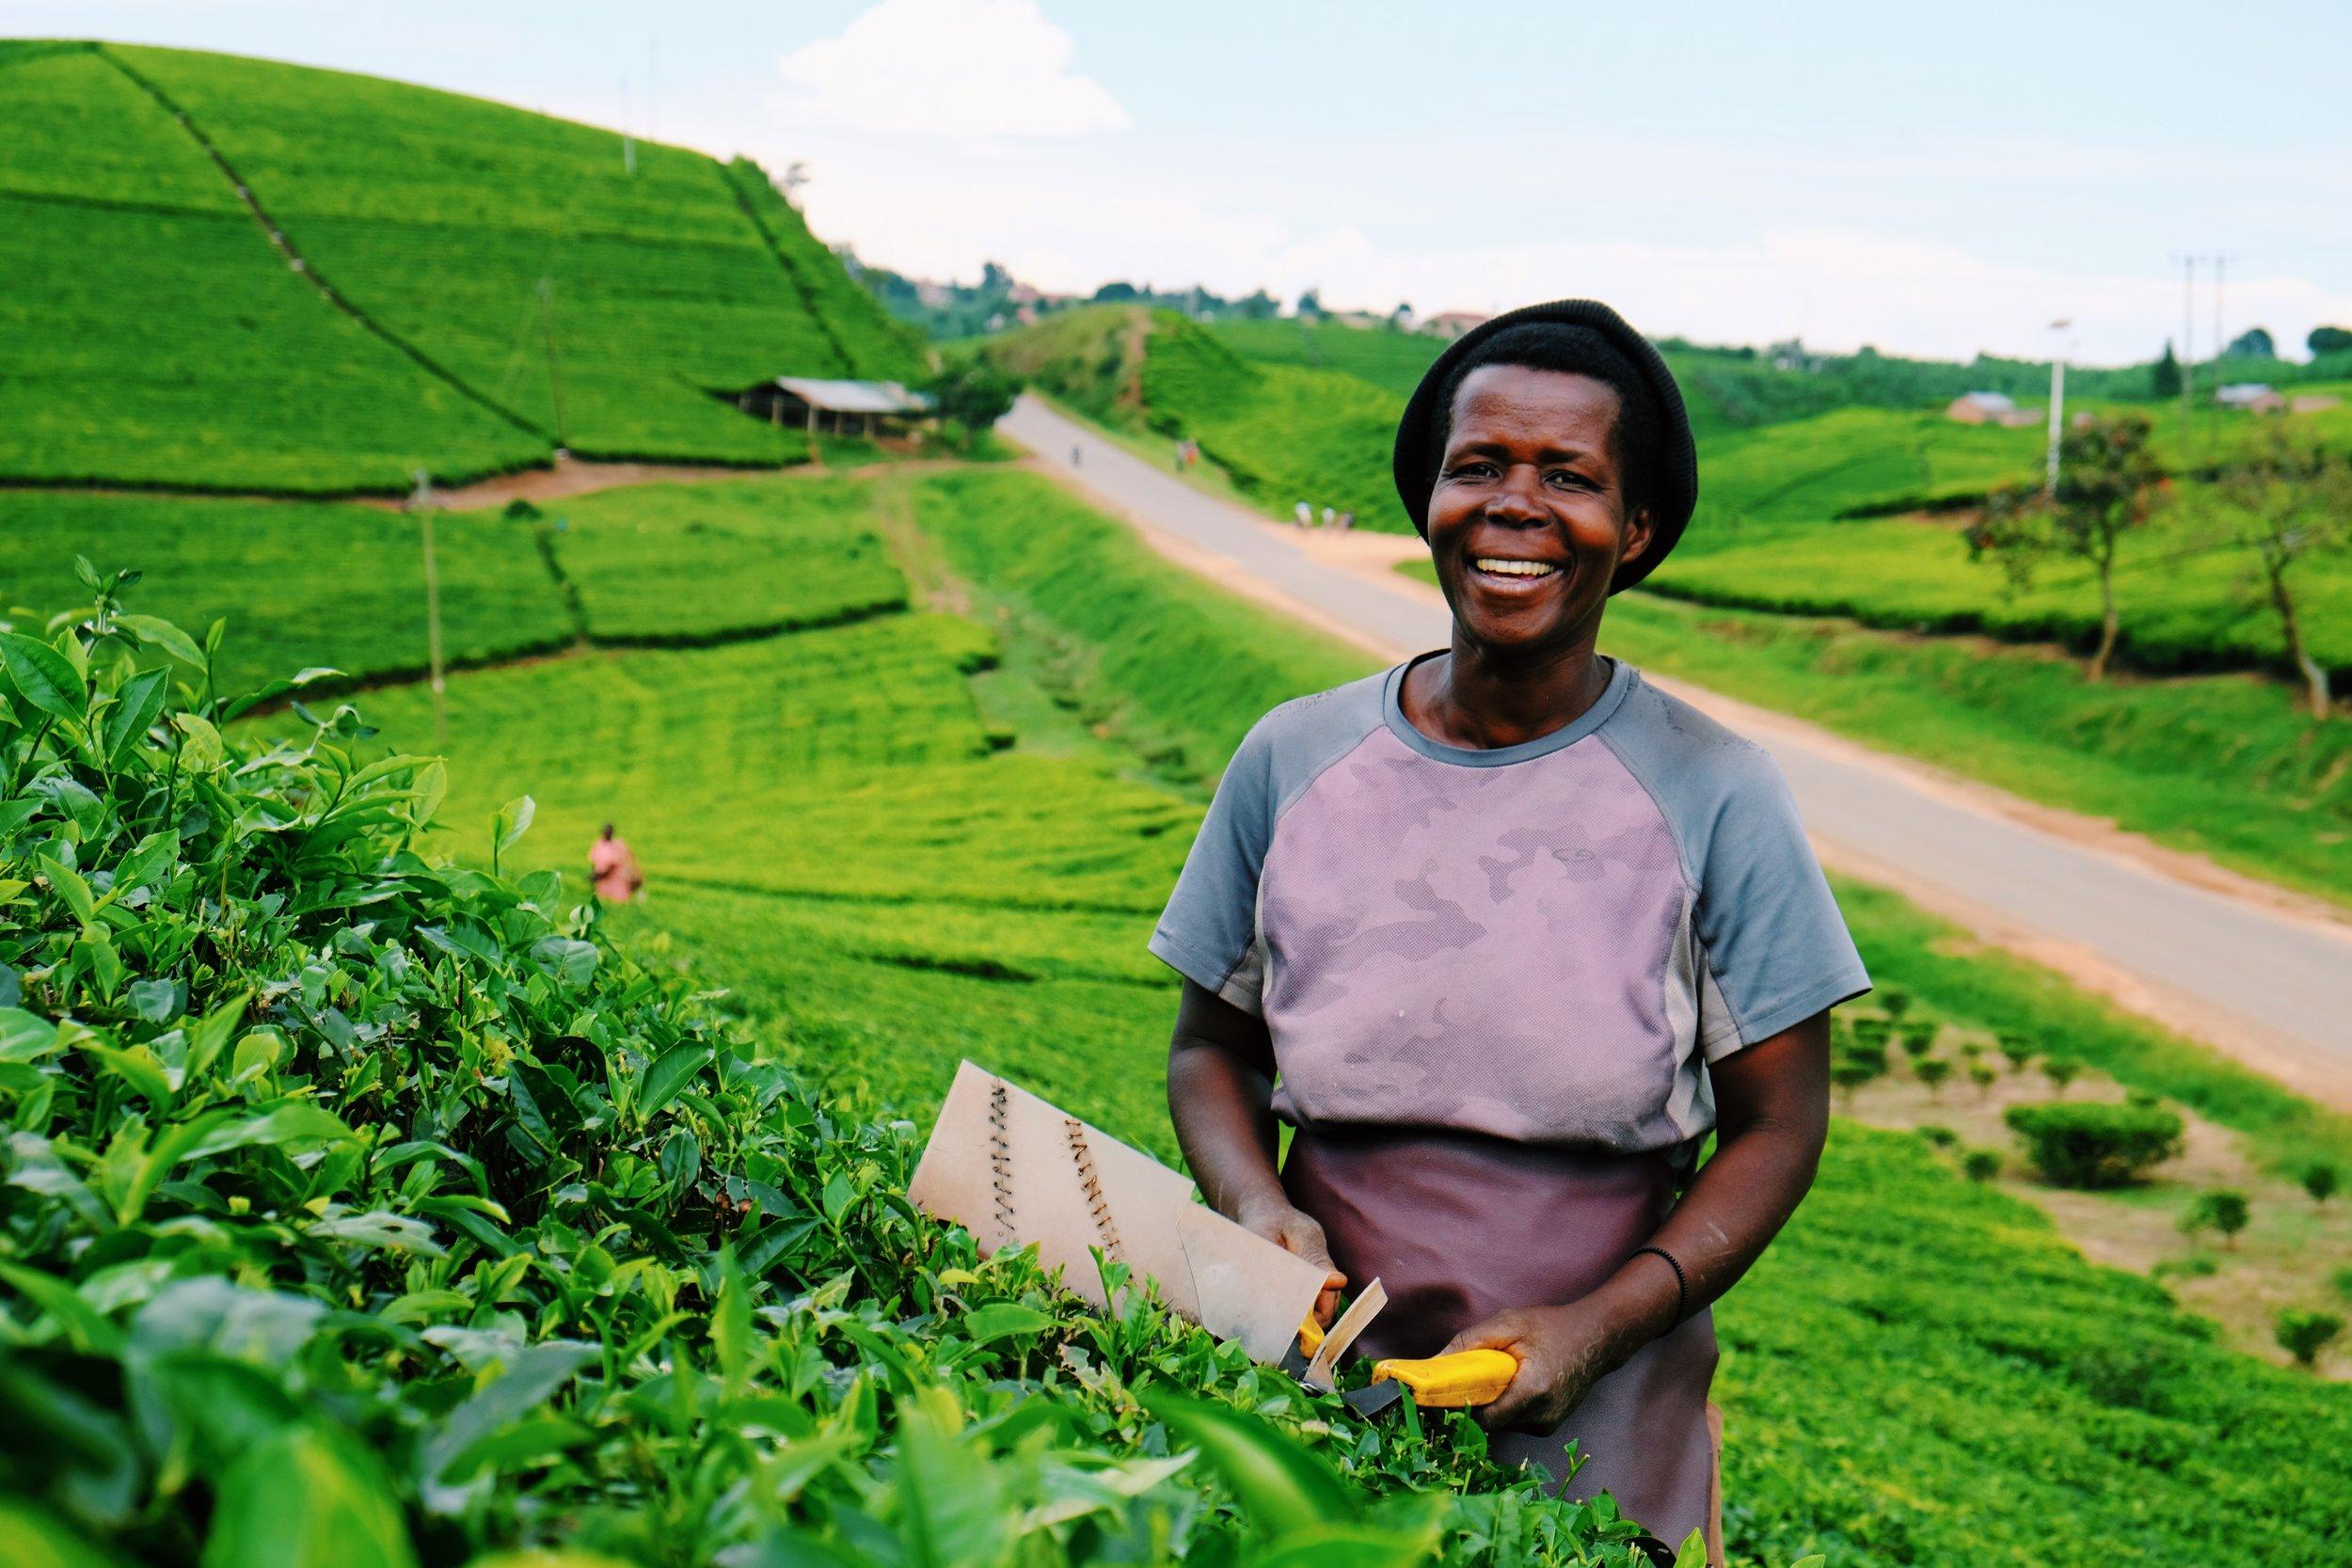 Tea plucker Uganda by Joost Bastmeijer.JPG